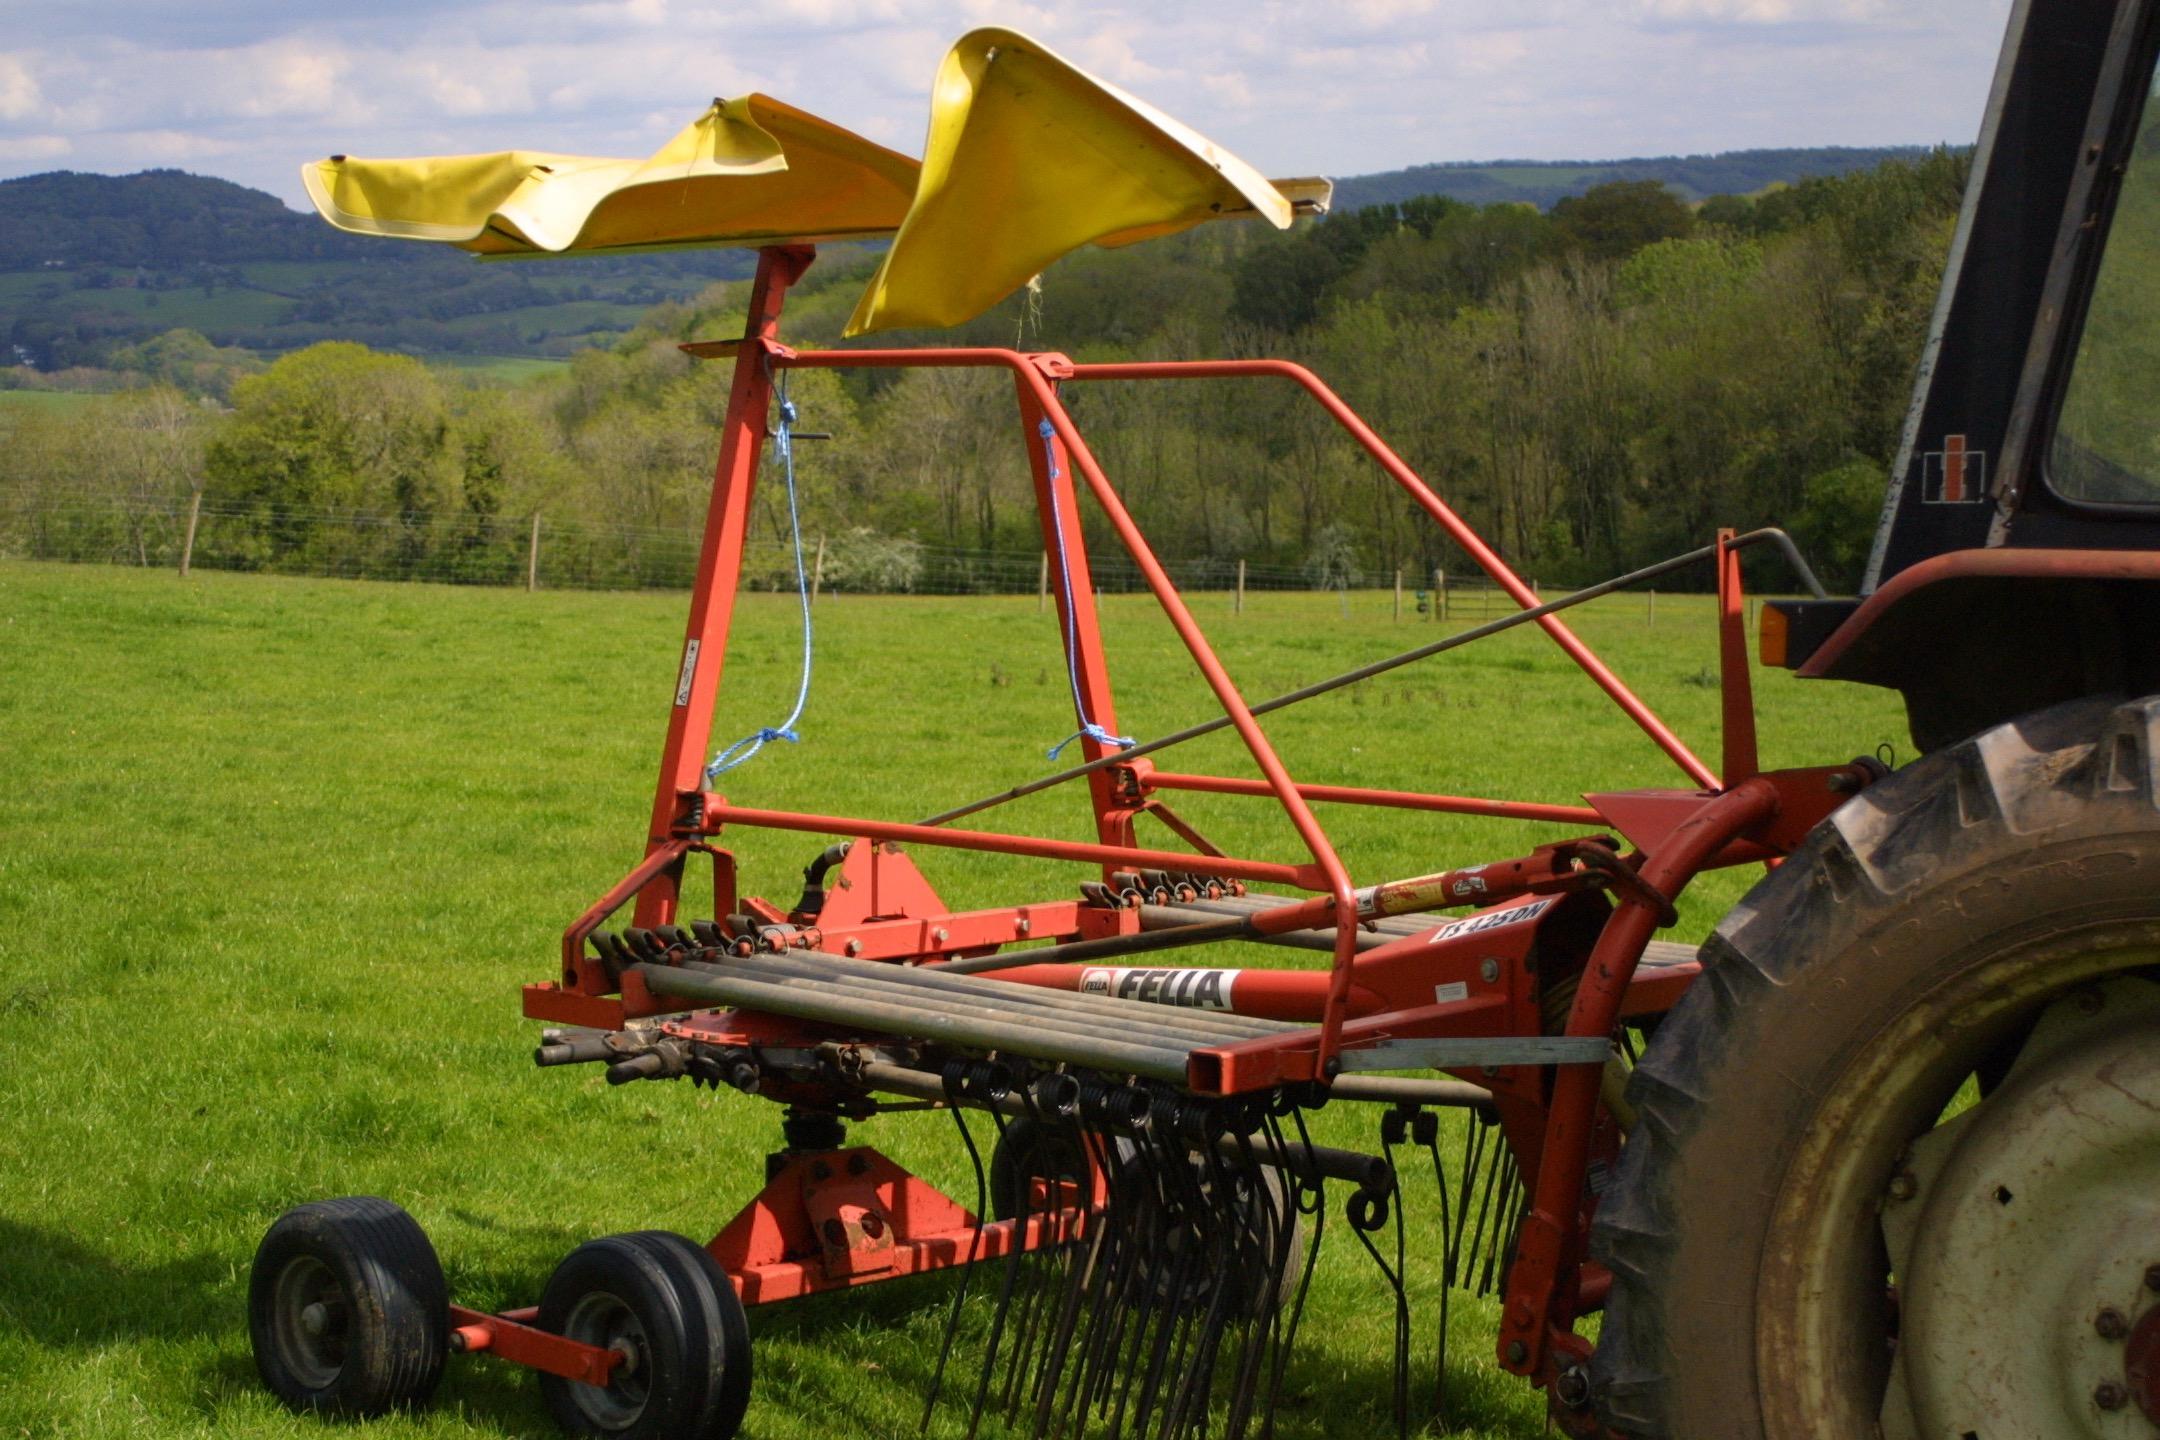 For Sale Fella TS425DN Single-Rotor Rake – Used